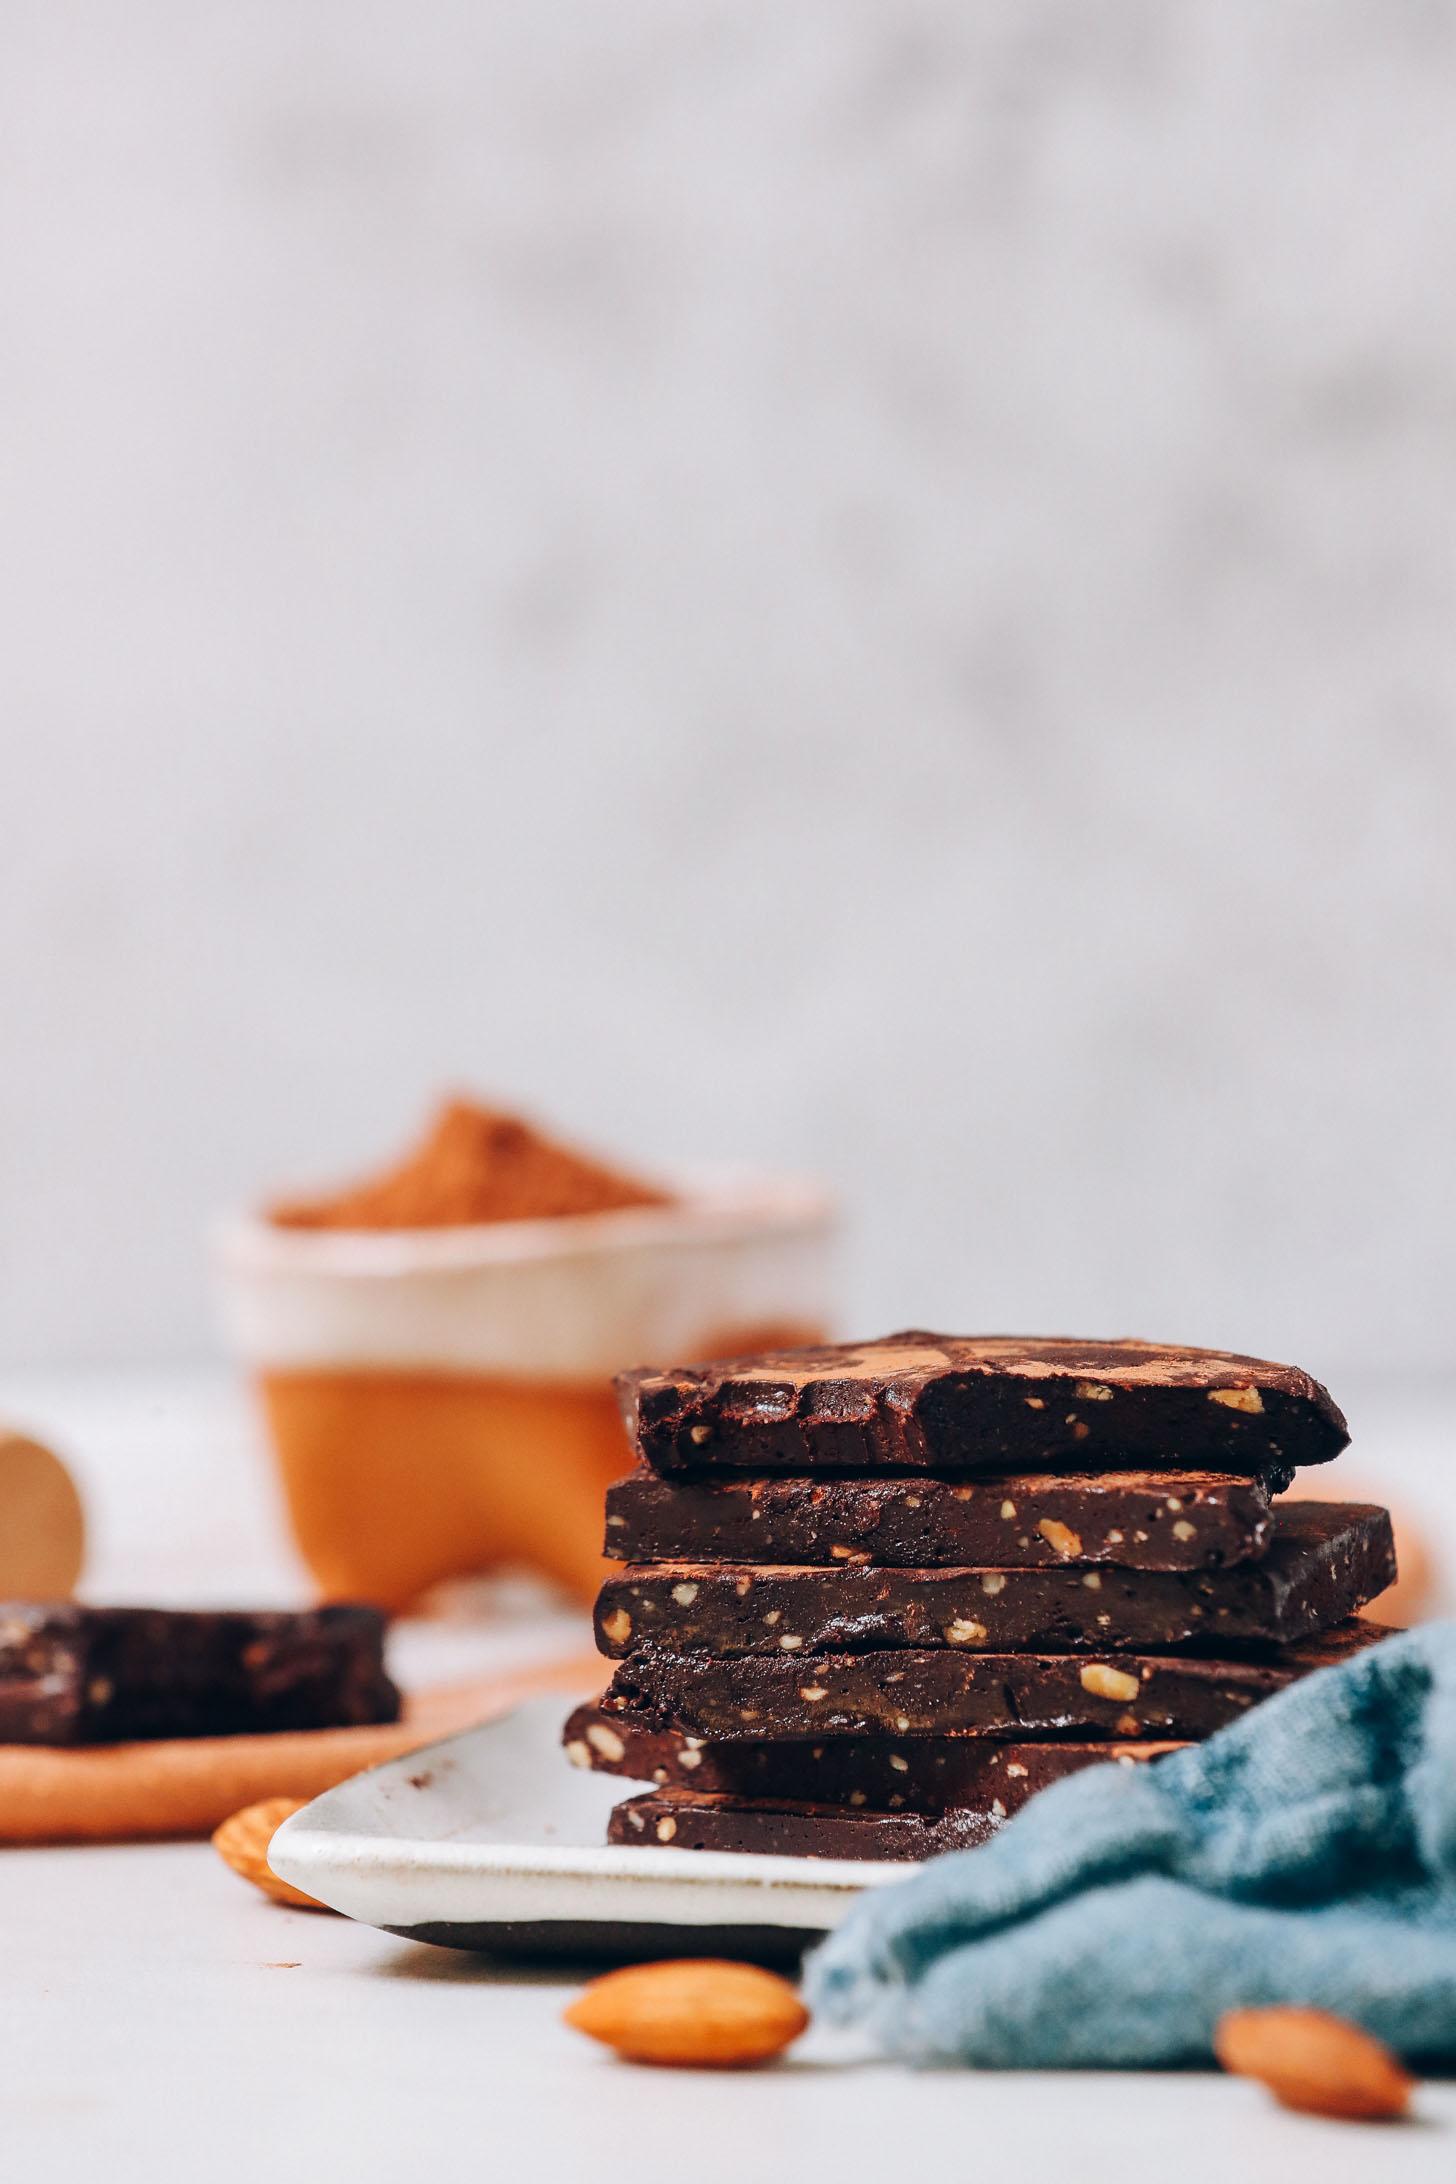 Stack of homemade Honey Mama's Chocolate Bars on a tray